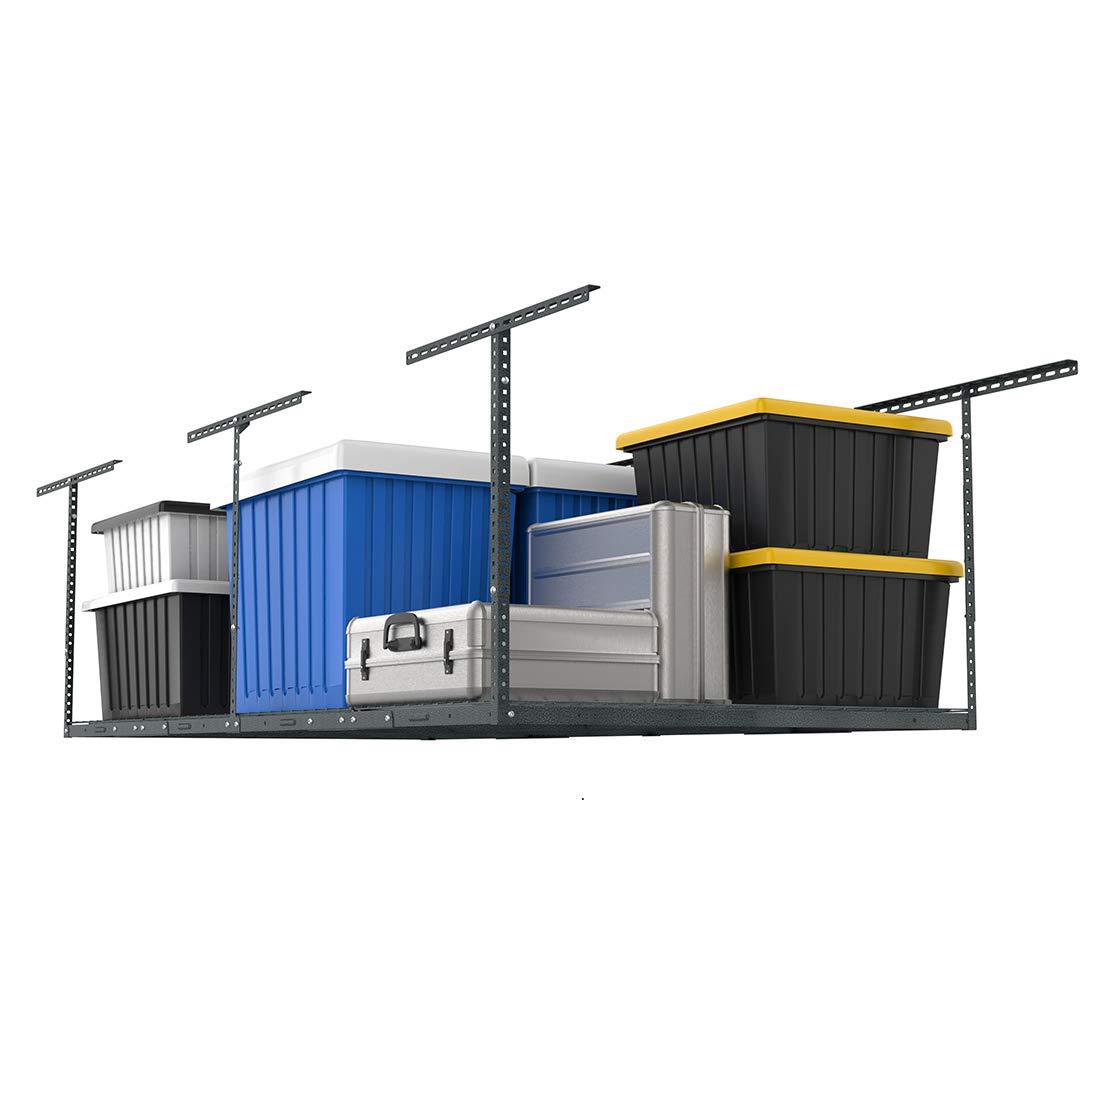 FLEXIMOUNTS 4x8 Overhead Garage Storage Rack Adjustable Ceiling Garage Rack Heavy Duty, 96'' Length x 48'' Width x (22''-40'' Ceiling Dropdown), Hammertone